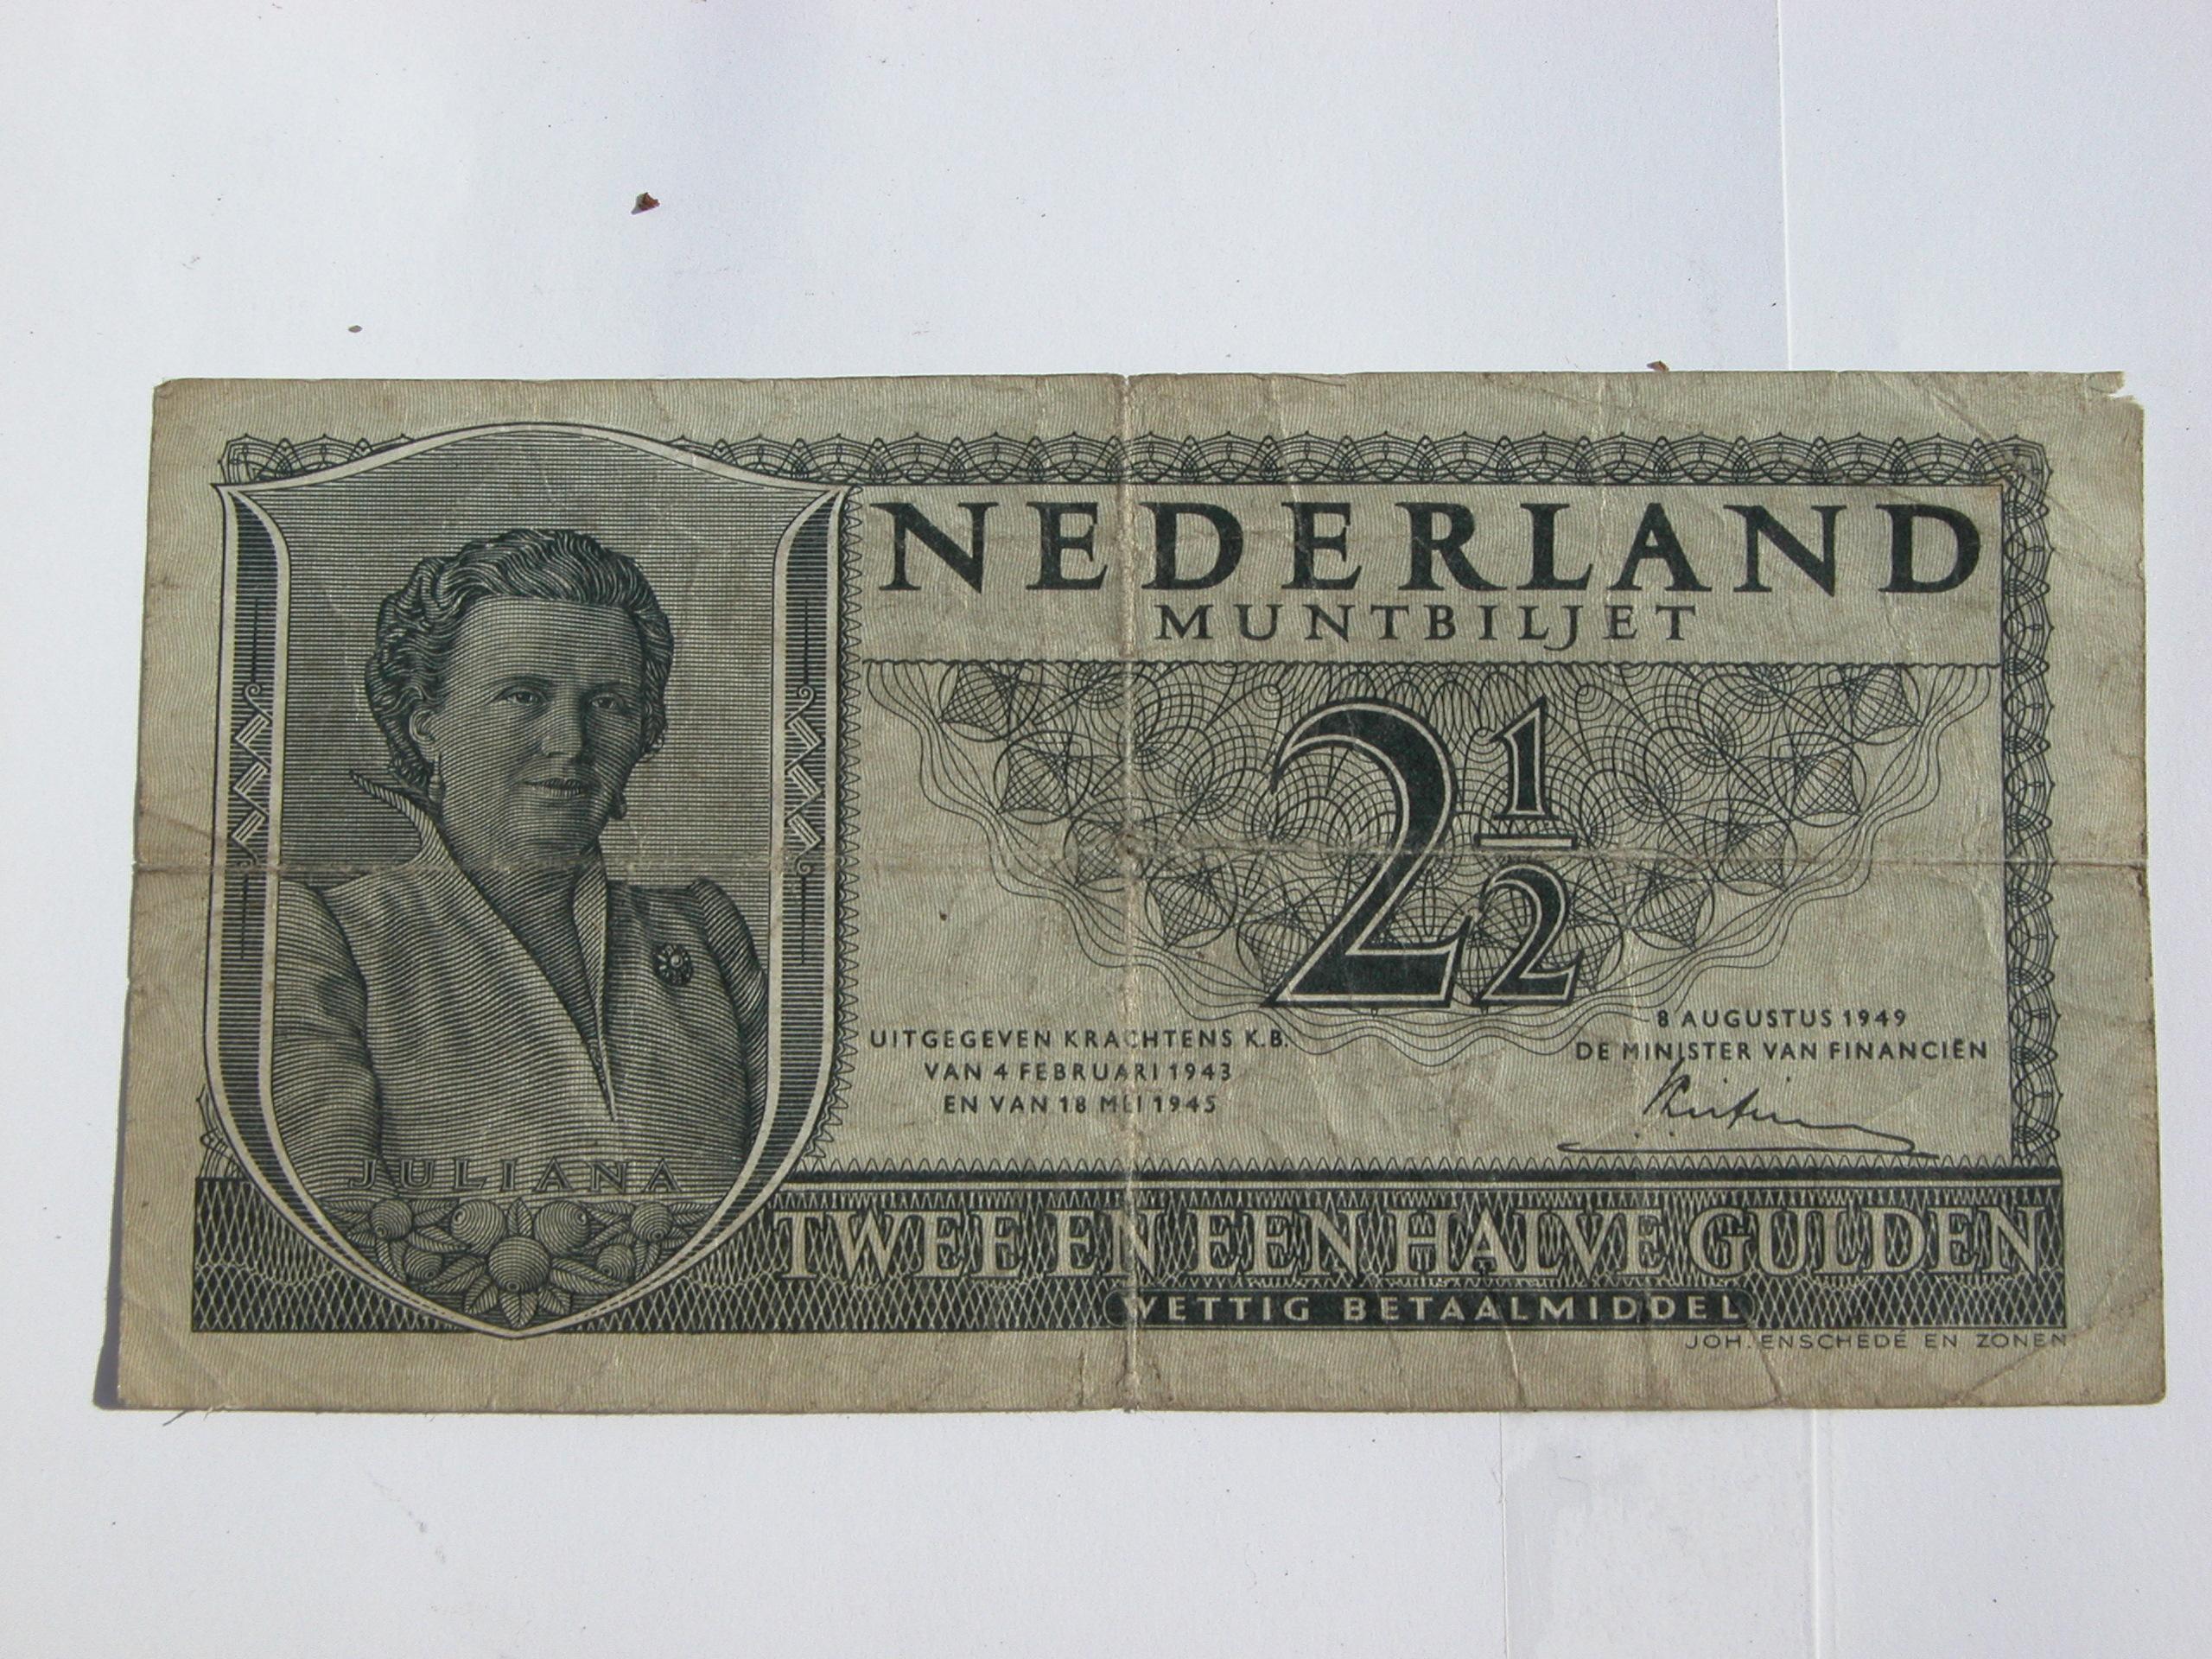 old currency money 2.5 dutch guilder 2.5 gulden